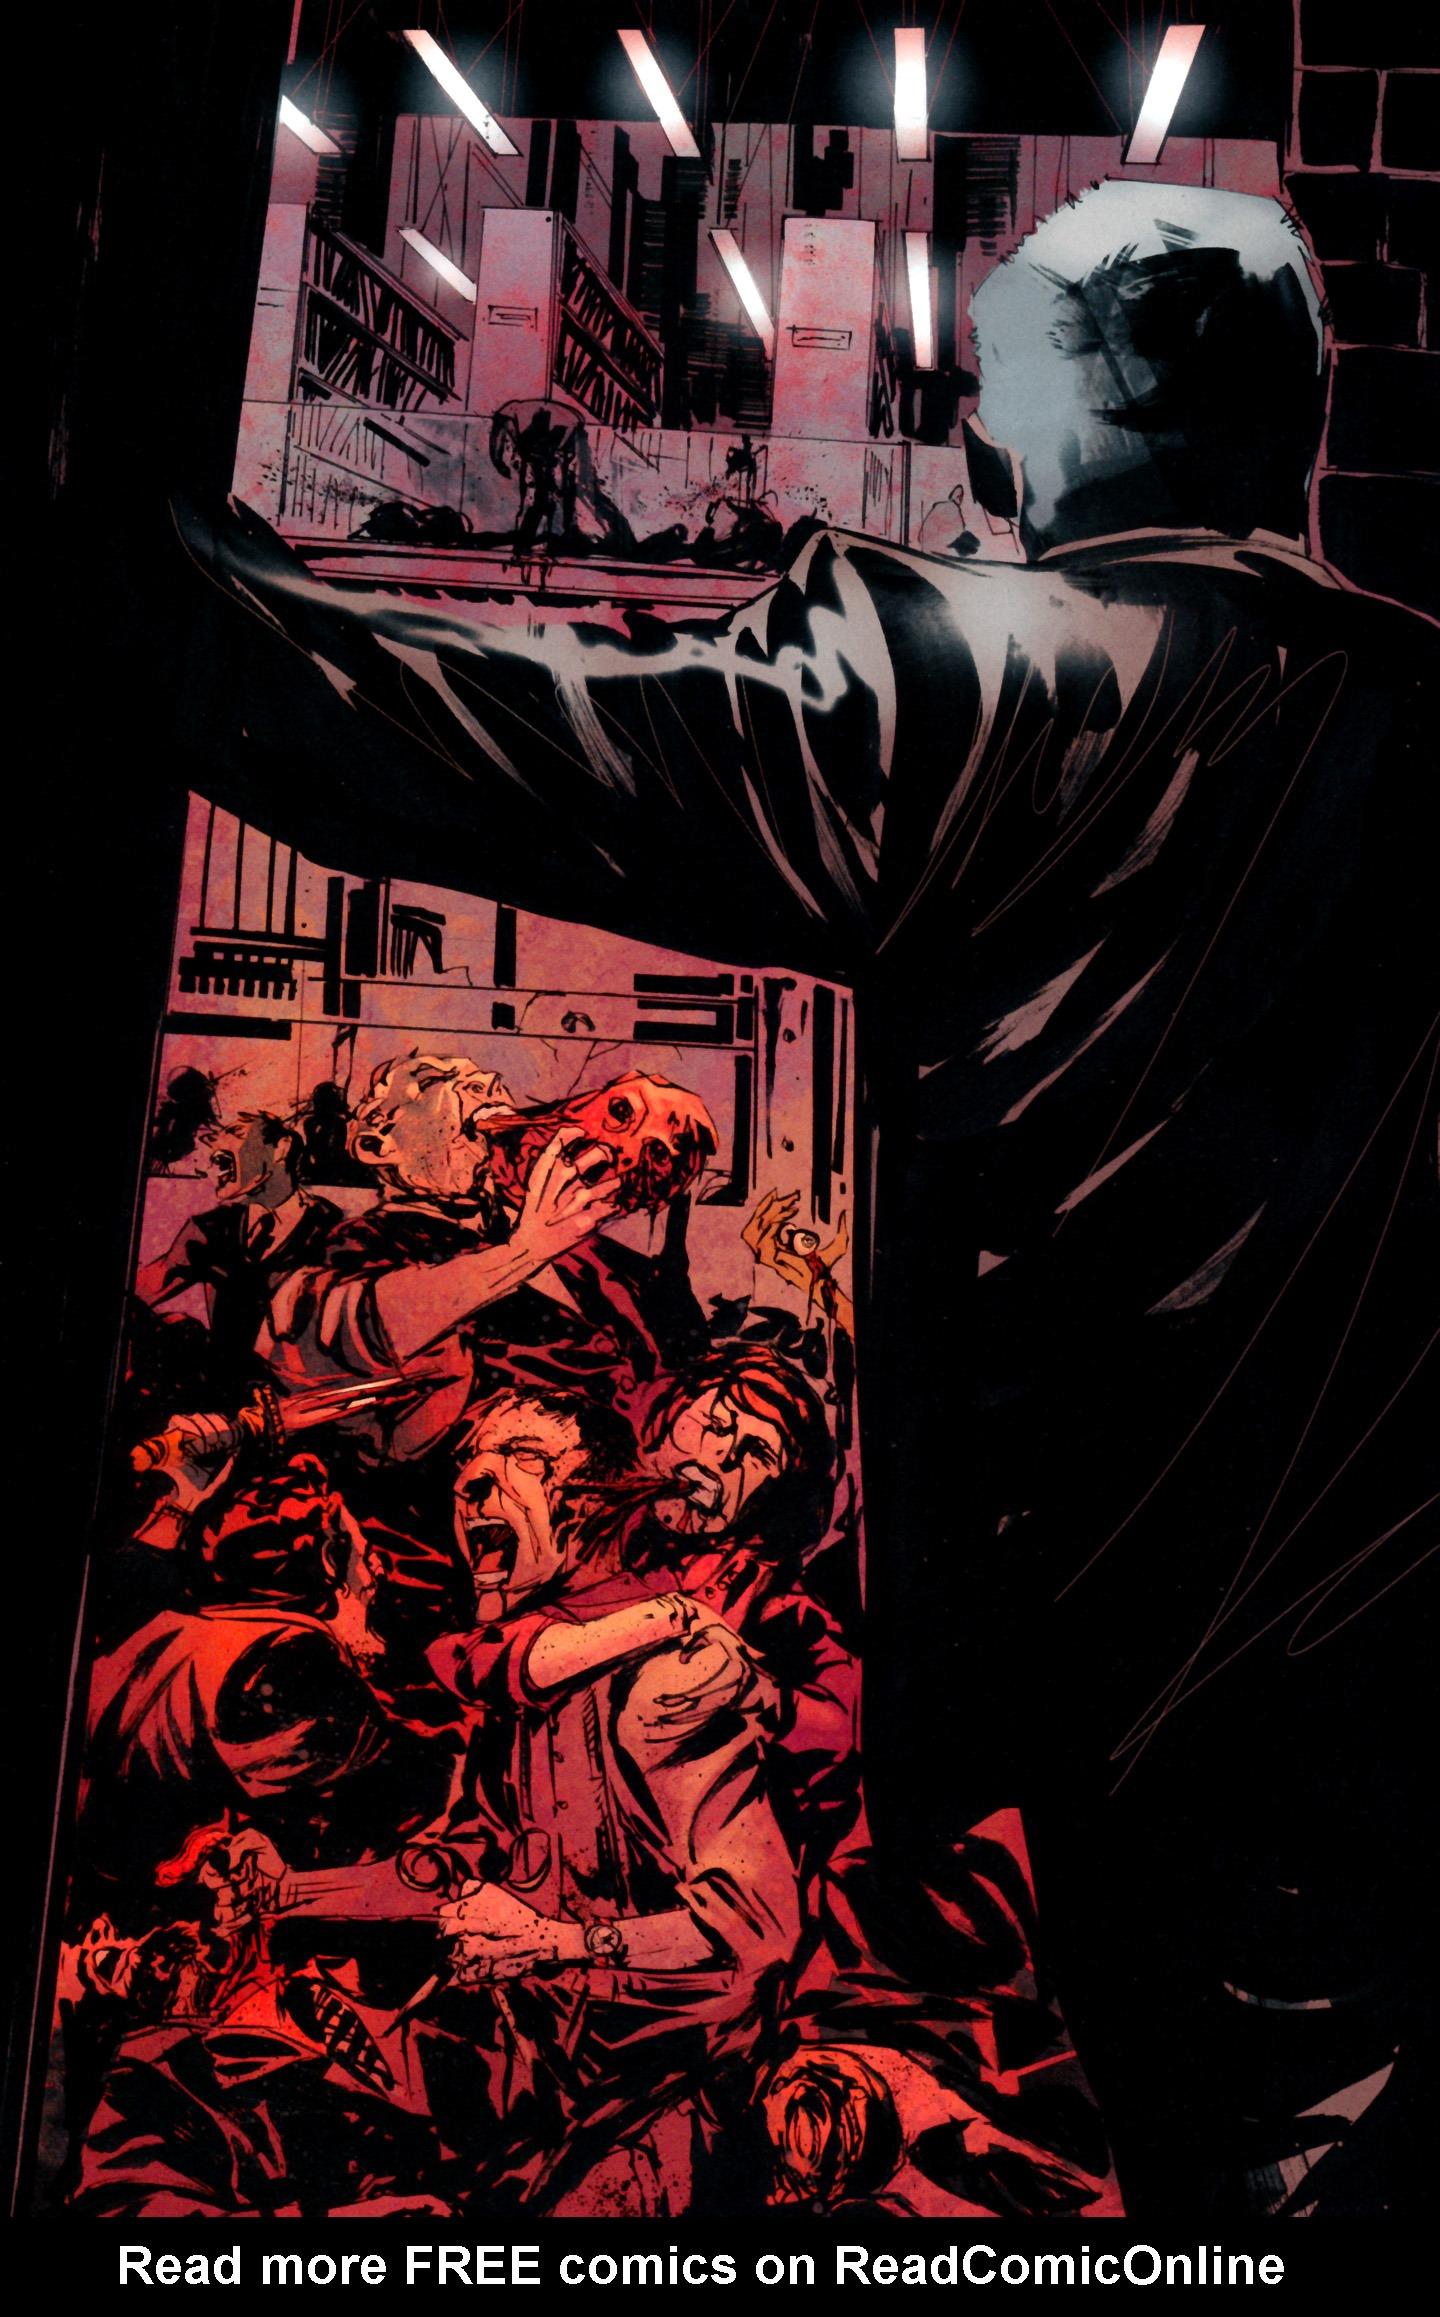 Read online American Vampire: Lord of Nightmares comic -  Issue #1 - 14